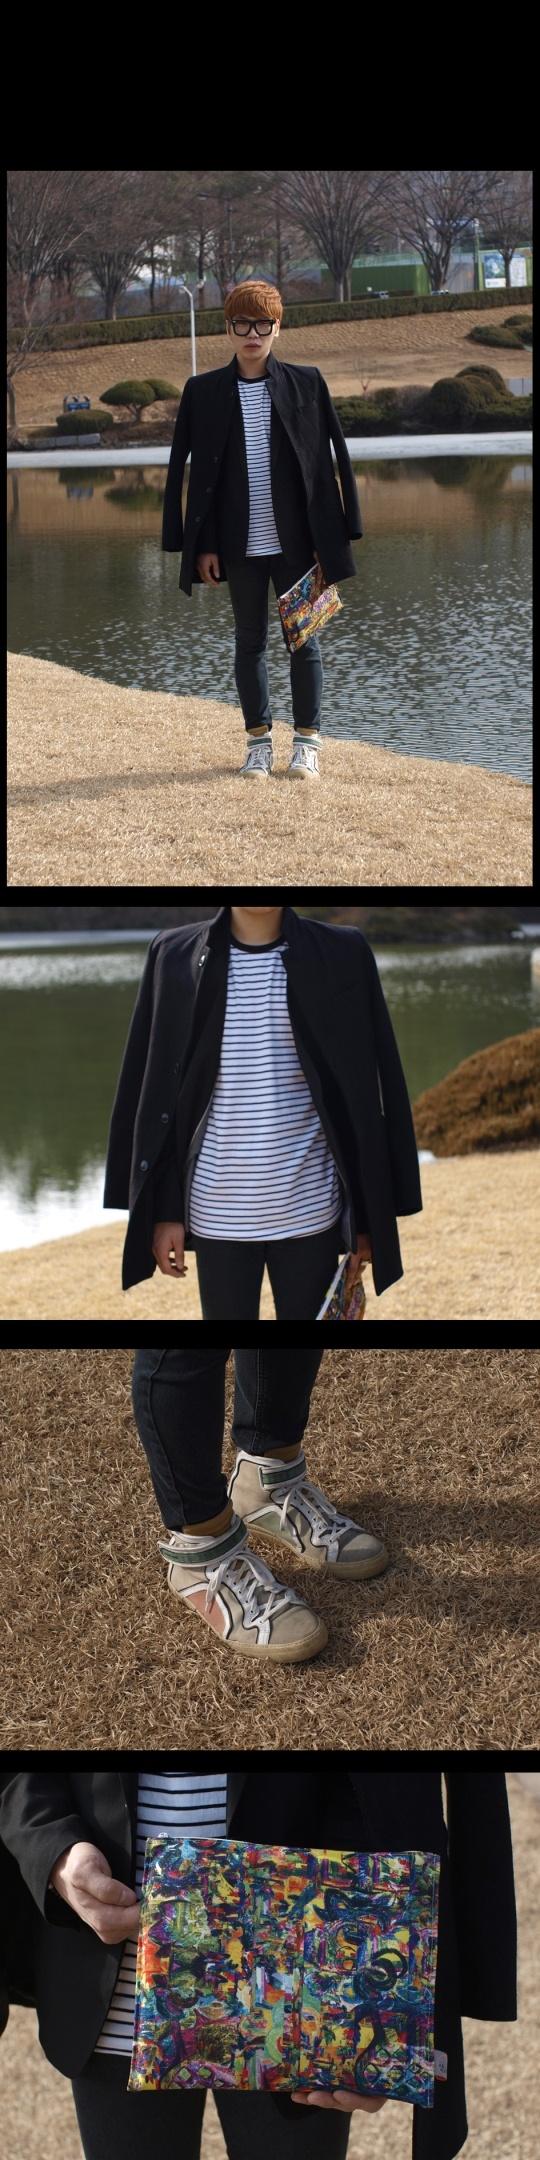 black jacket, striped tee, pouch  street fashion of seoul, korea